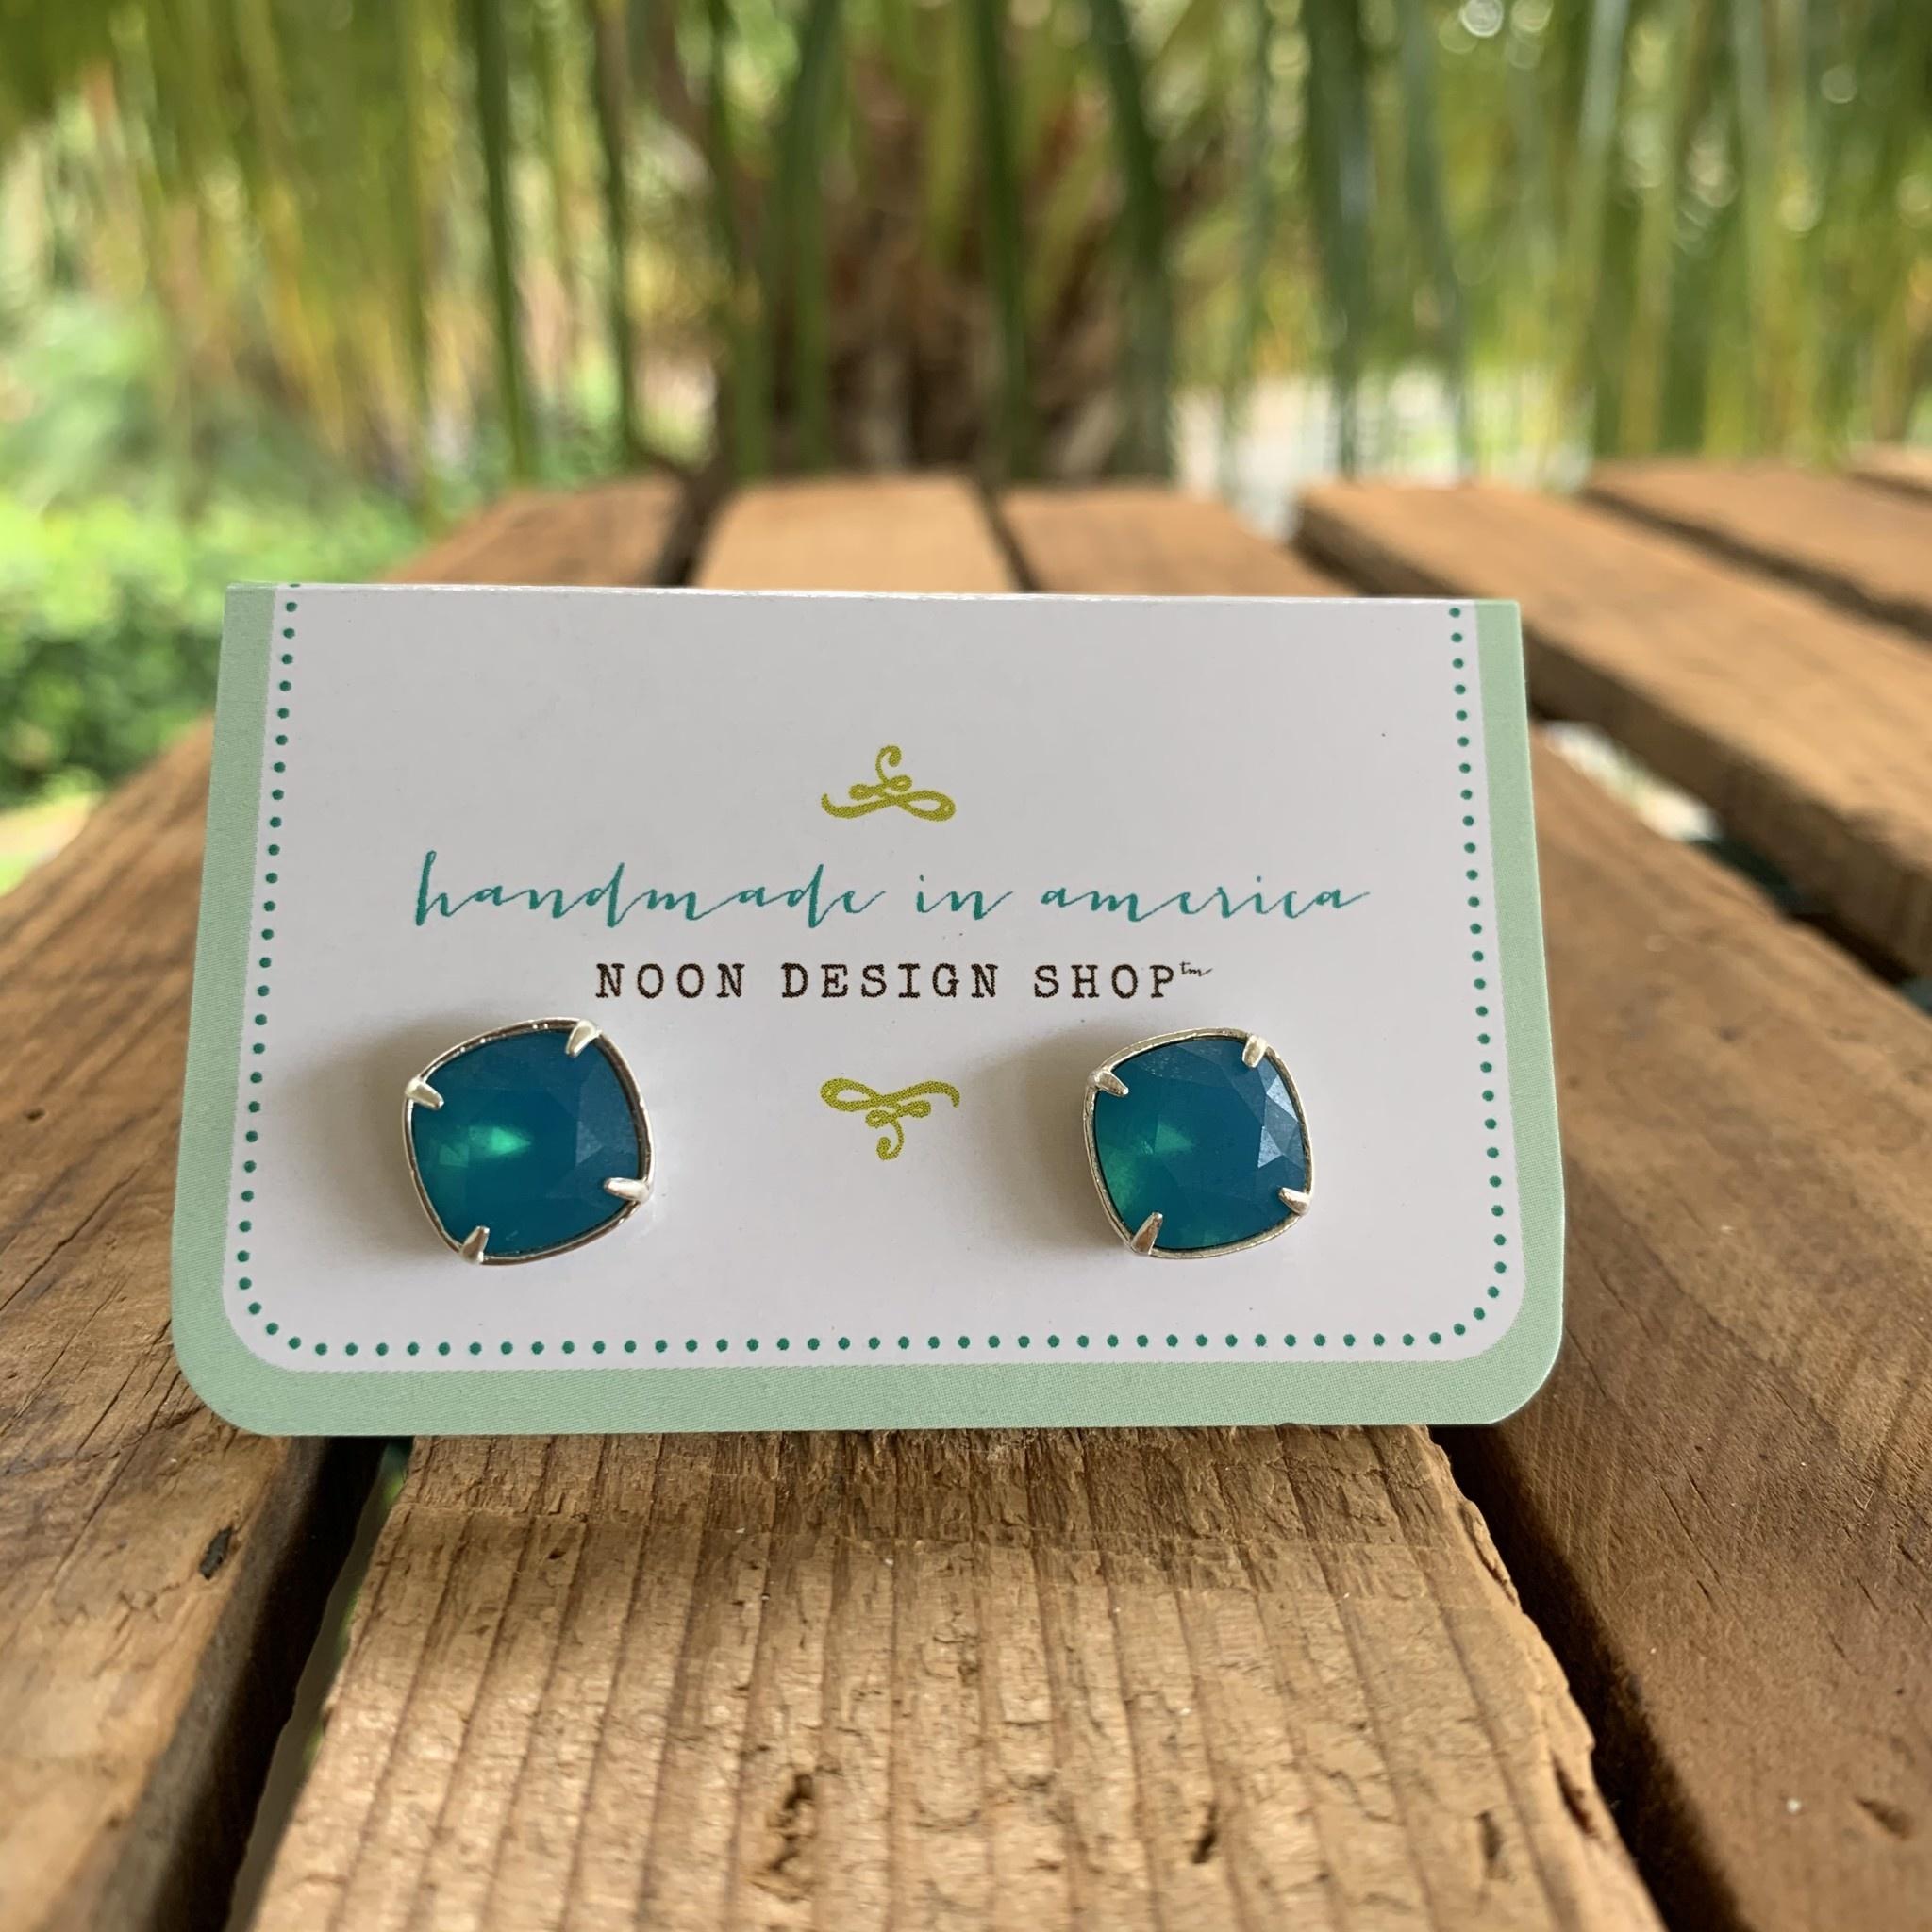 Island Jewelry Nouveau Swarovski Stud Earrings